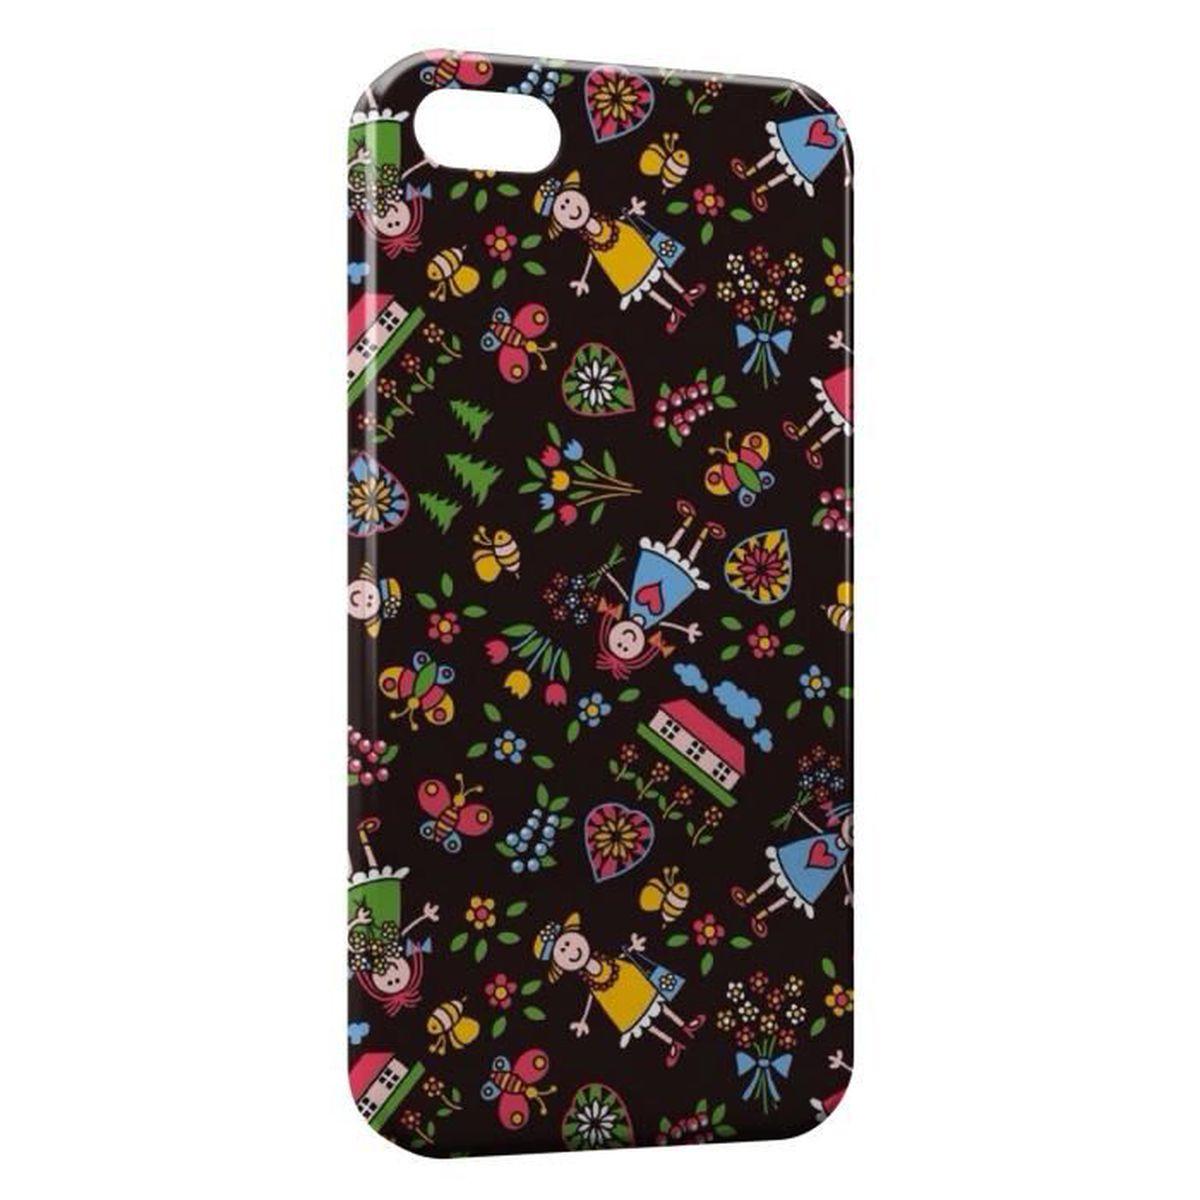 coque iphone 7 fleurs poupee